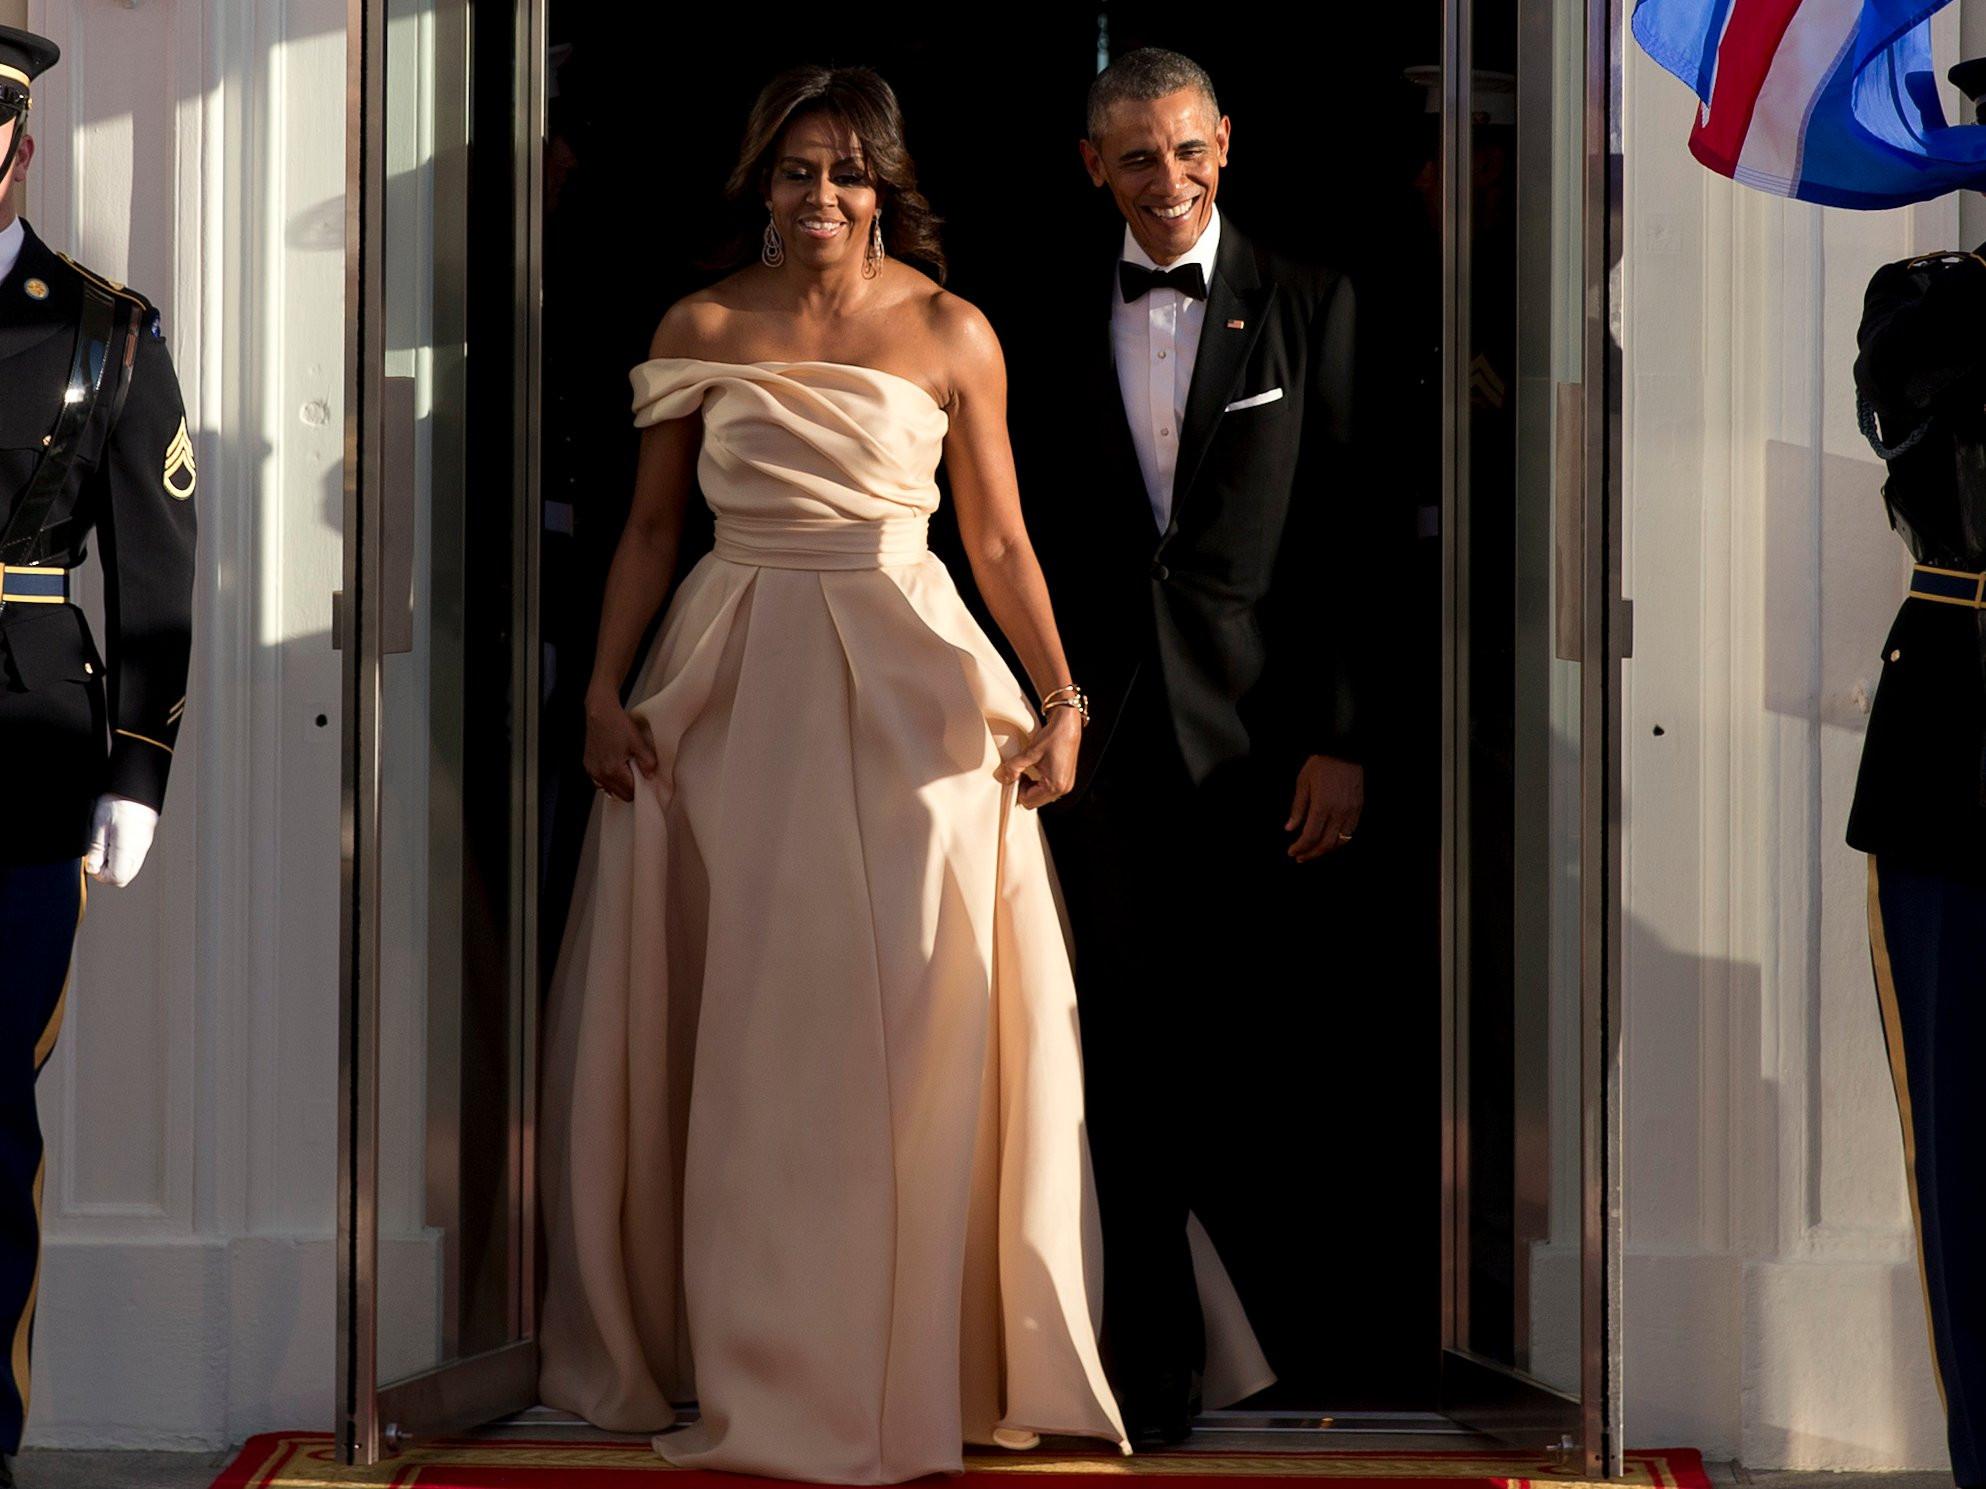 Michelle Obama State Dinner 2016 Dress  Michelle Obama Versace dress state dinner INSIDER